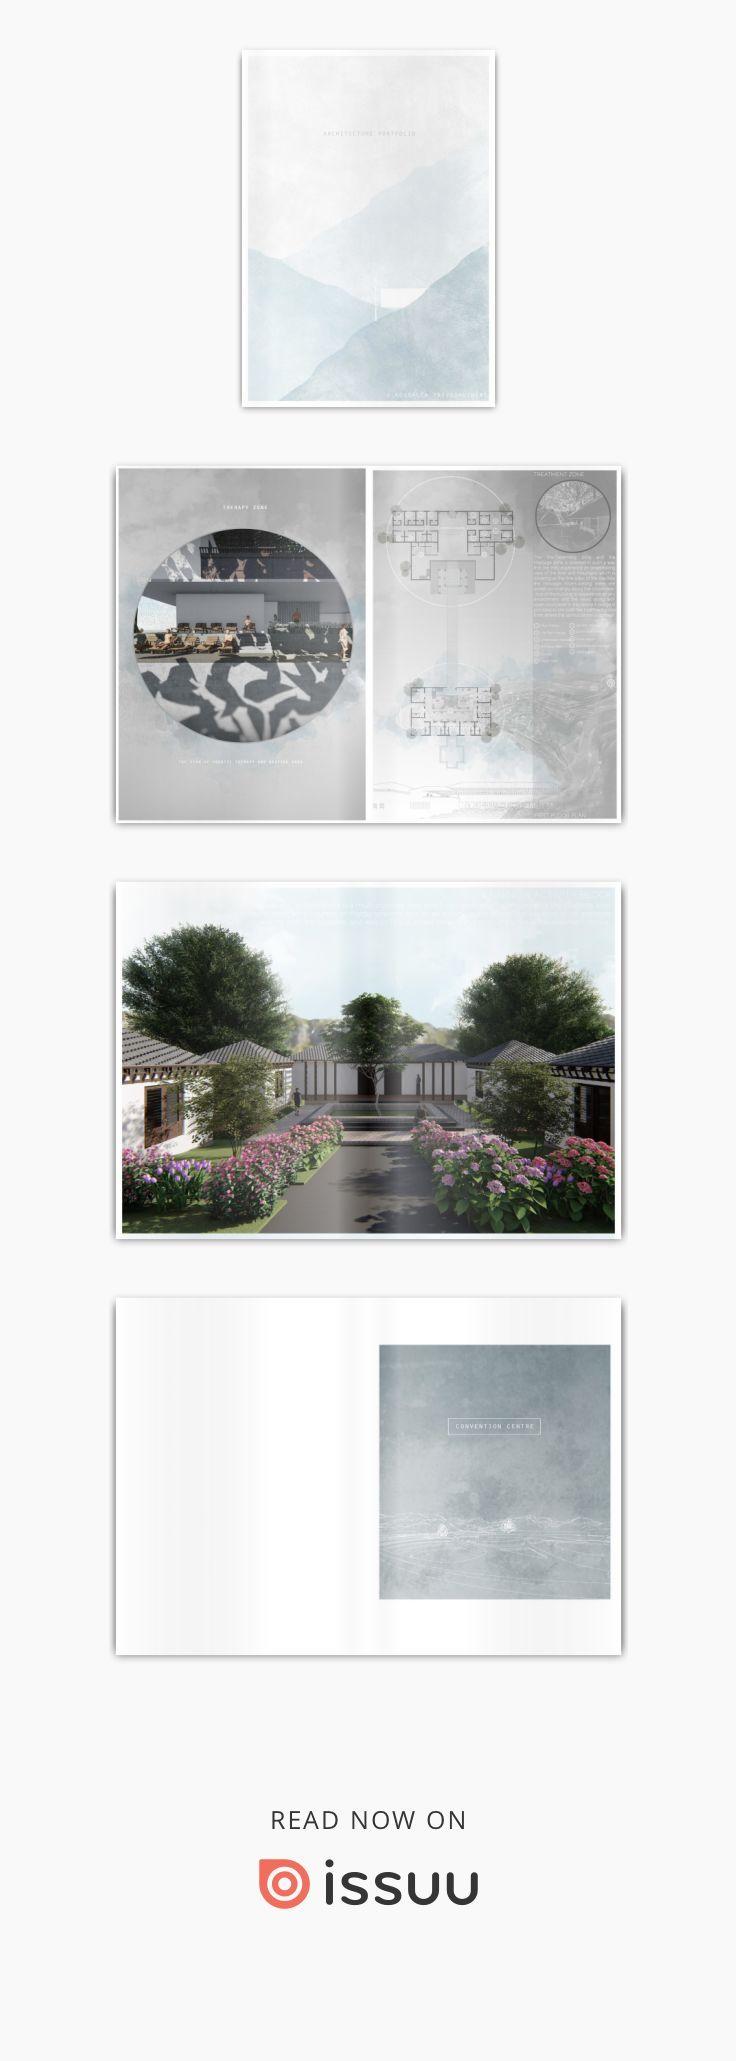 PORTFÓLIO DE ARQUITETURA – KOUSALYA   – Arquitetando